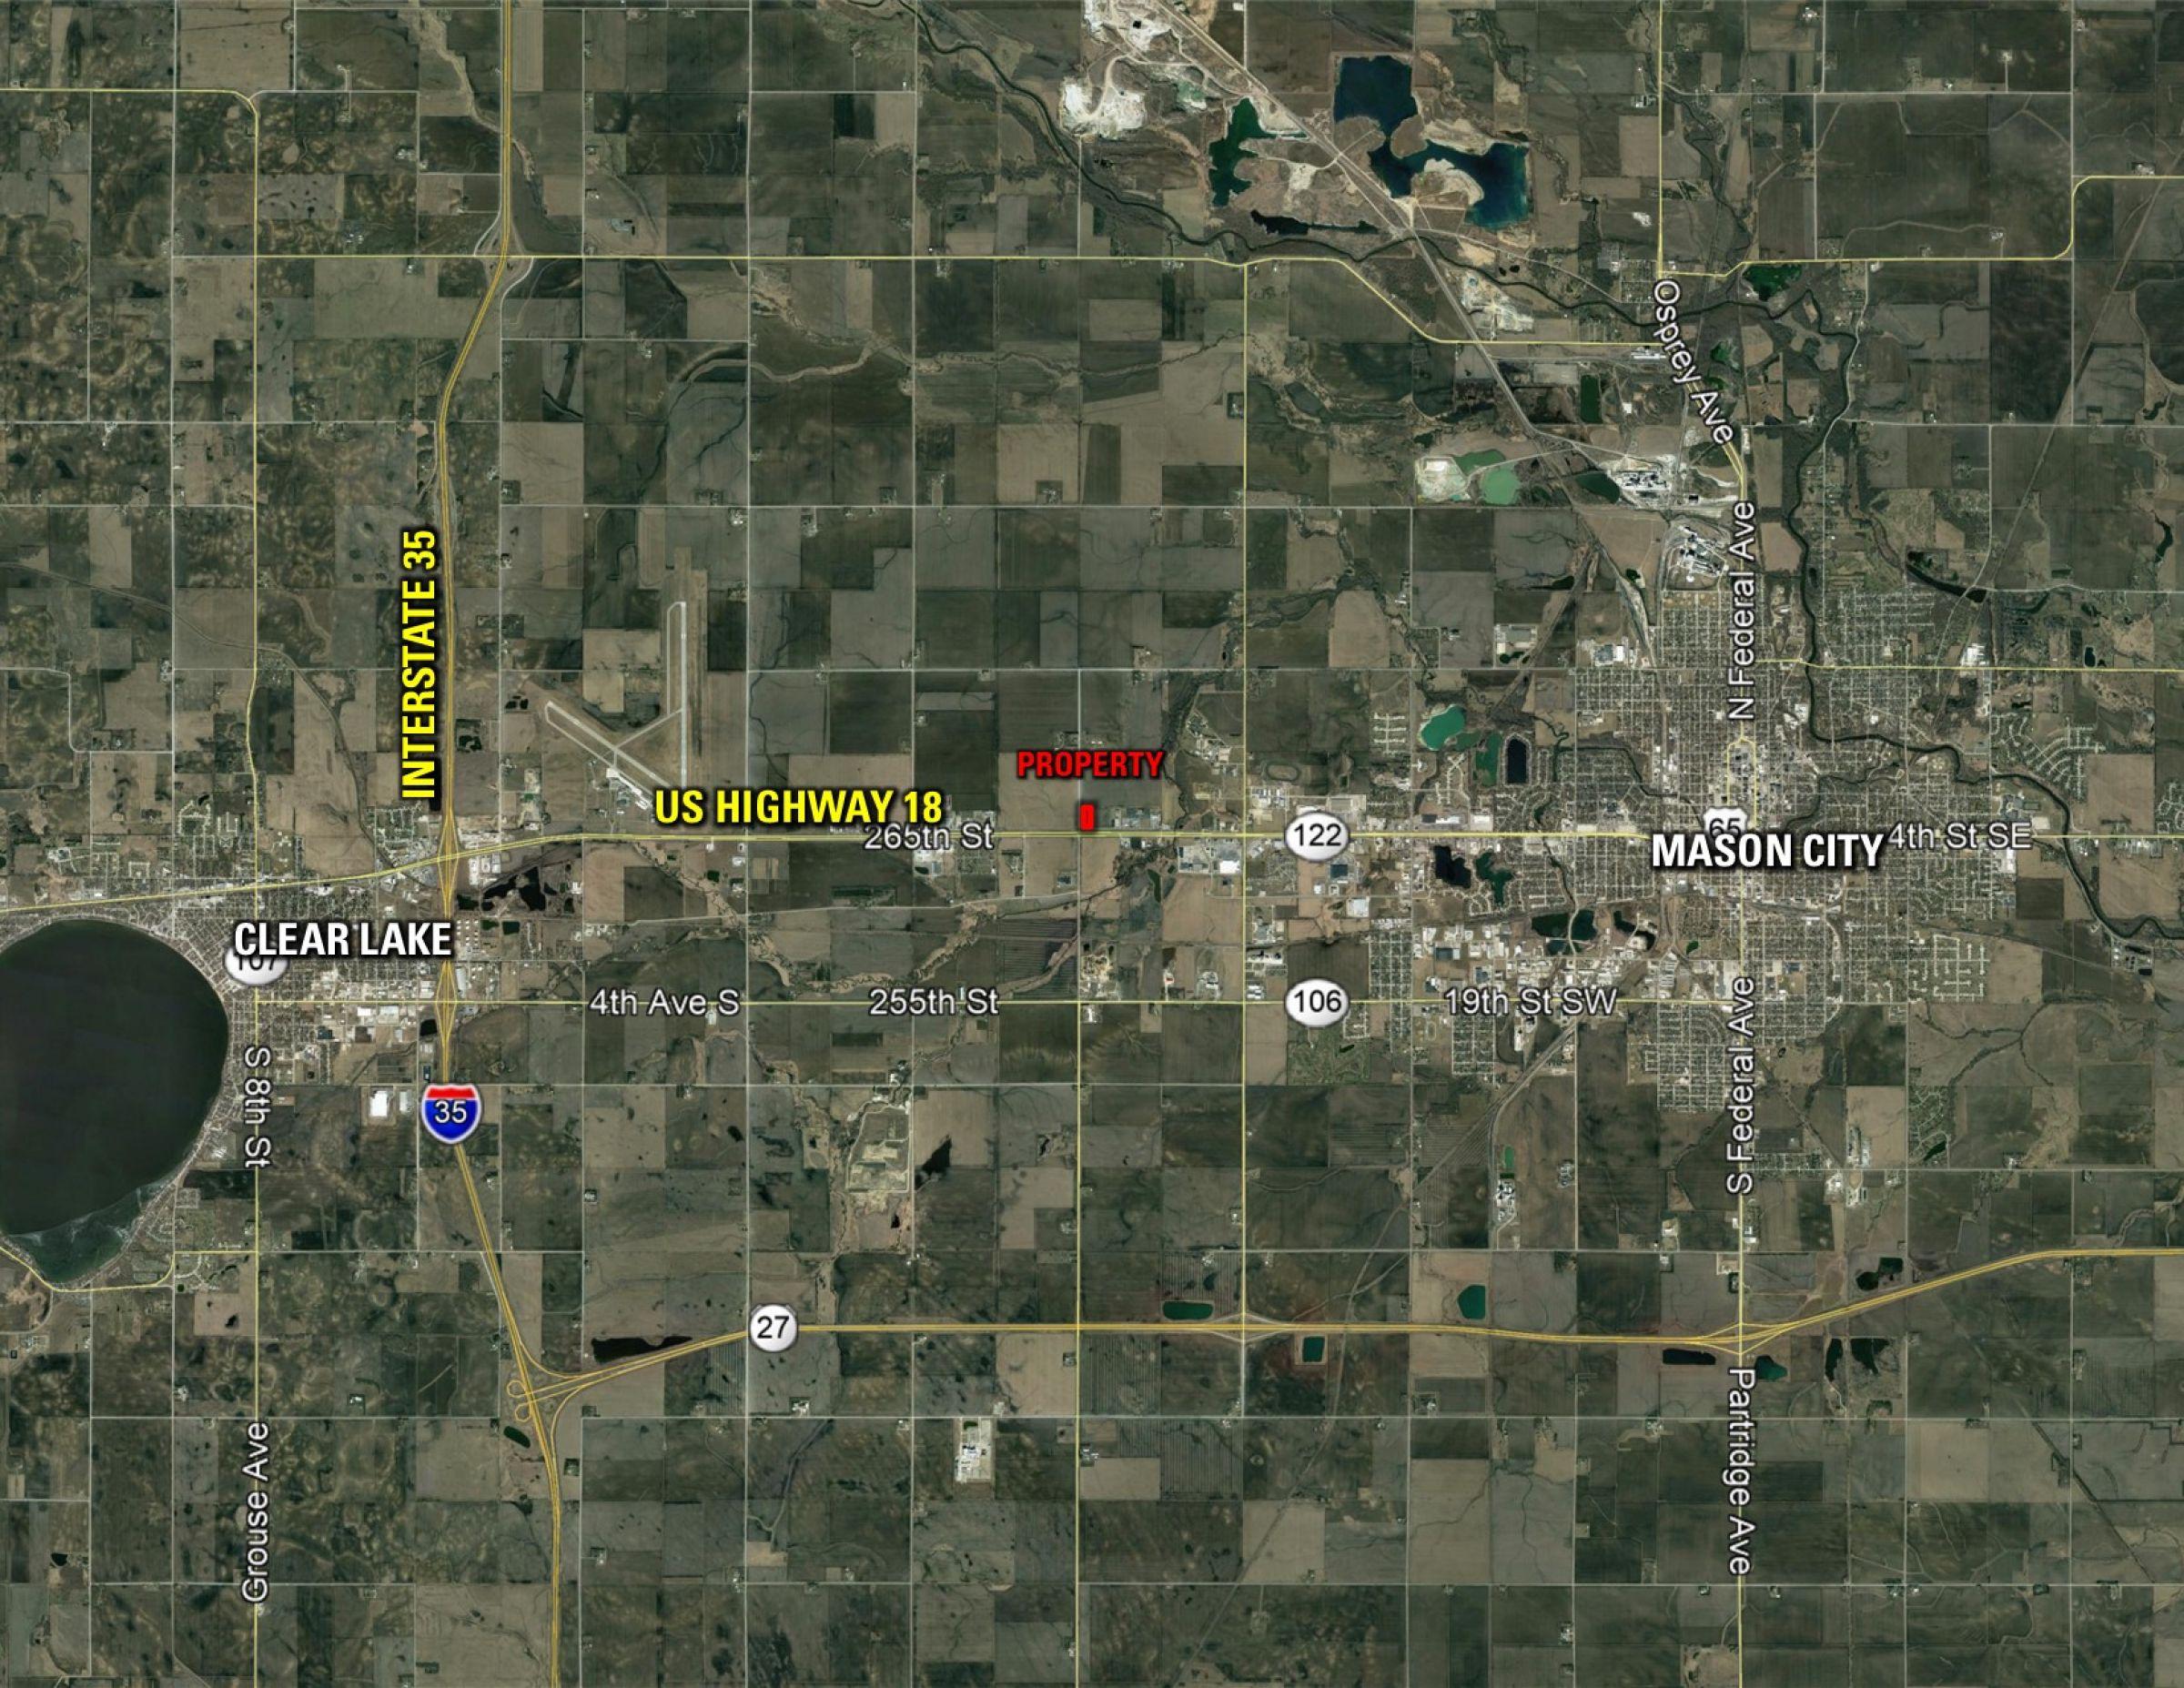 development-land-commercial-cerro-gordo-county-iowa-4-acres-listing-number-15642-1-2021-07-20-181649.jpg